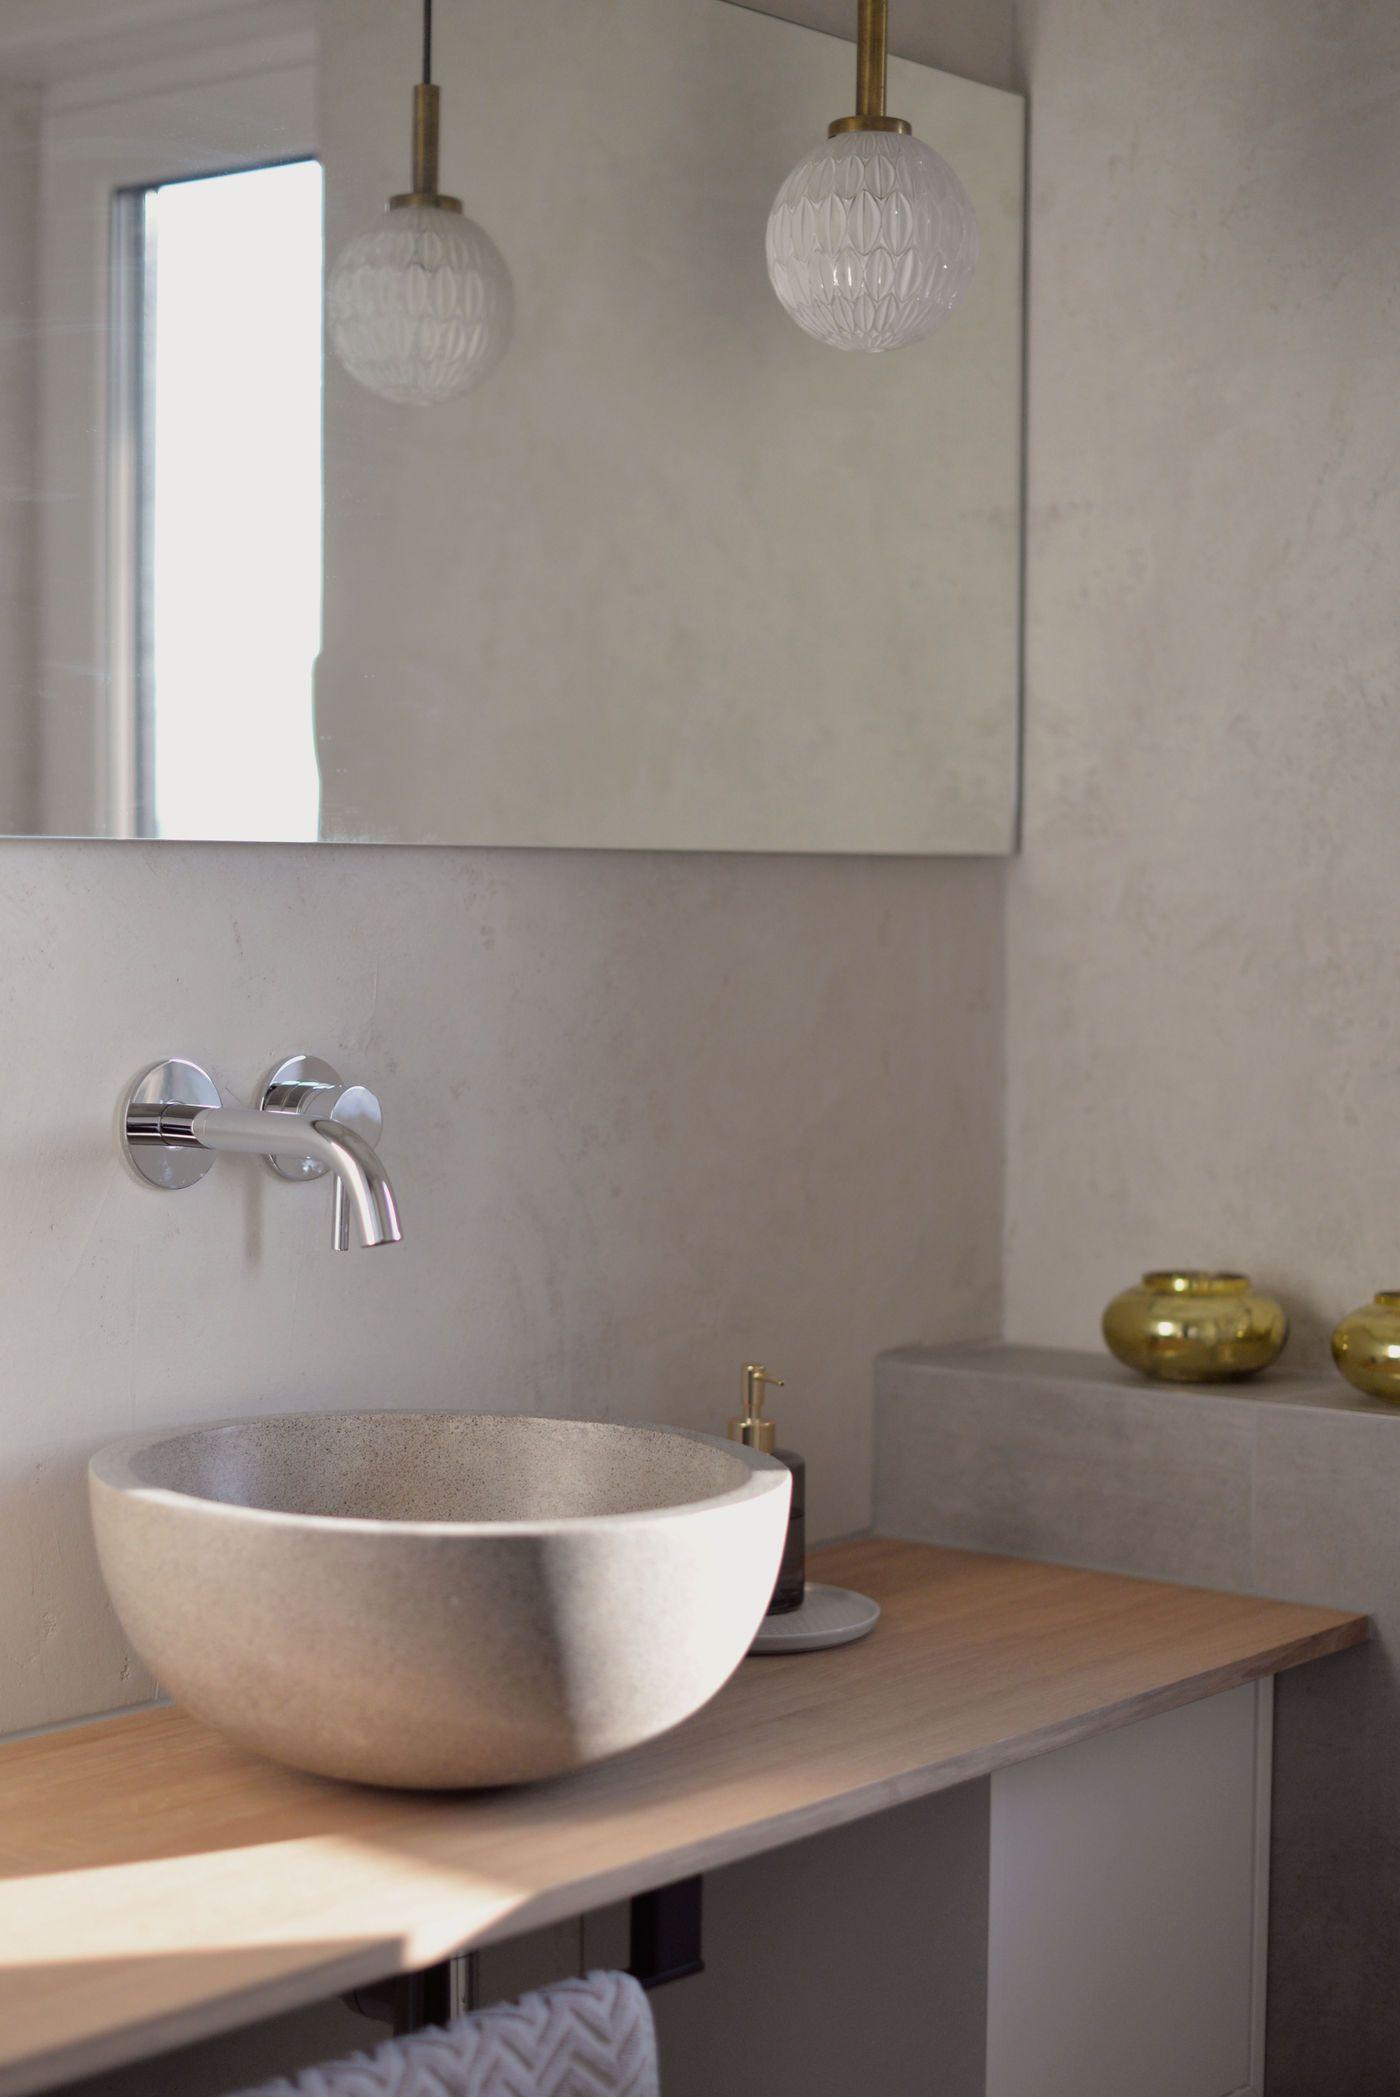 beton cir tolle ideen mit dem effektputz in betonoptik. Black Bedroom Furniture Sets. Home Design Ideas